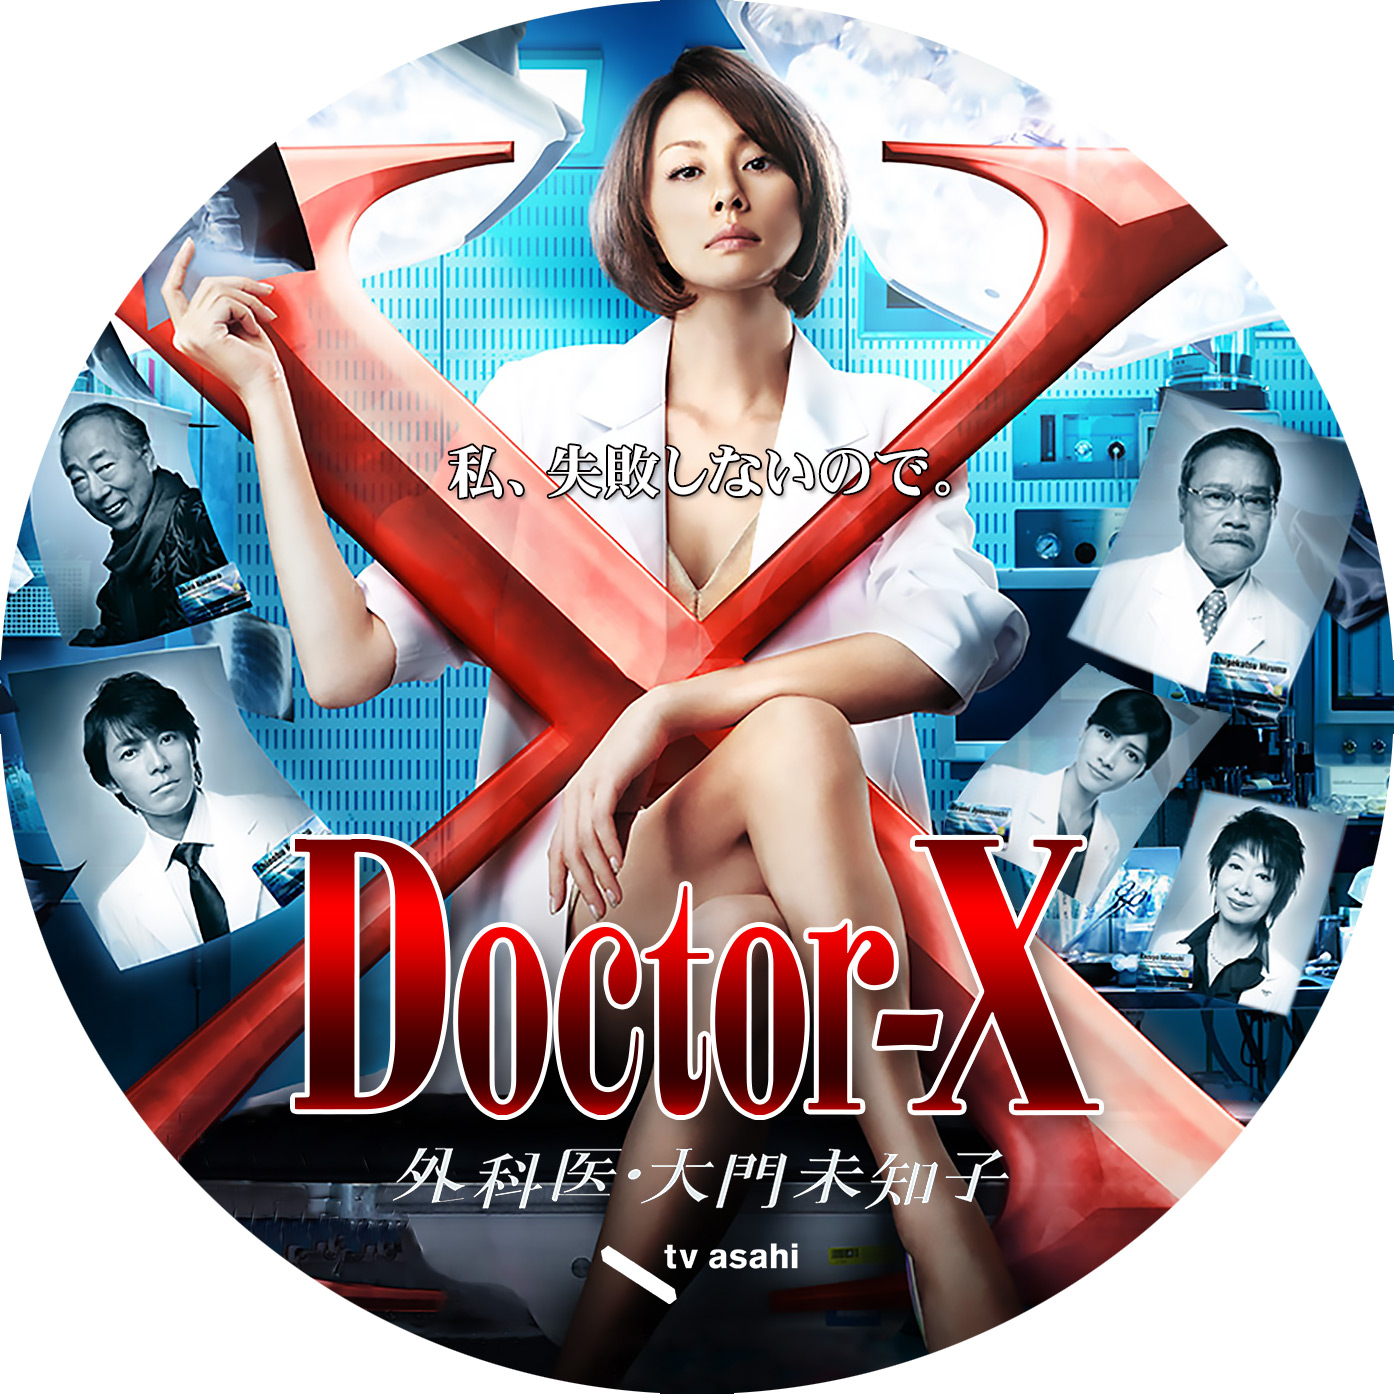 Doctor-X DVDラベル